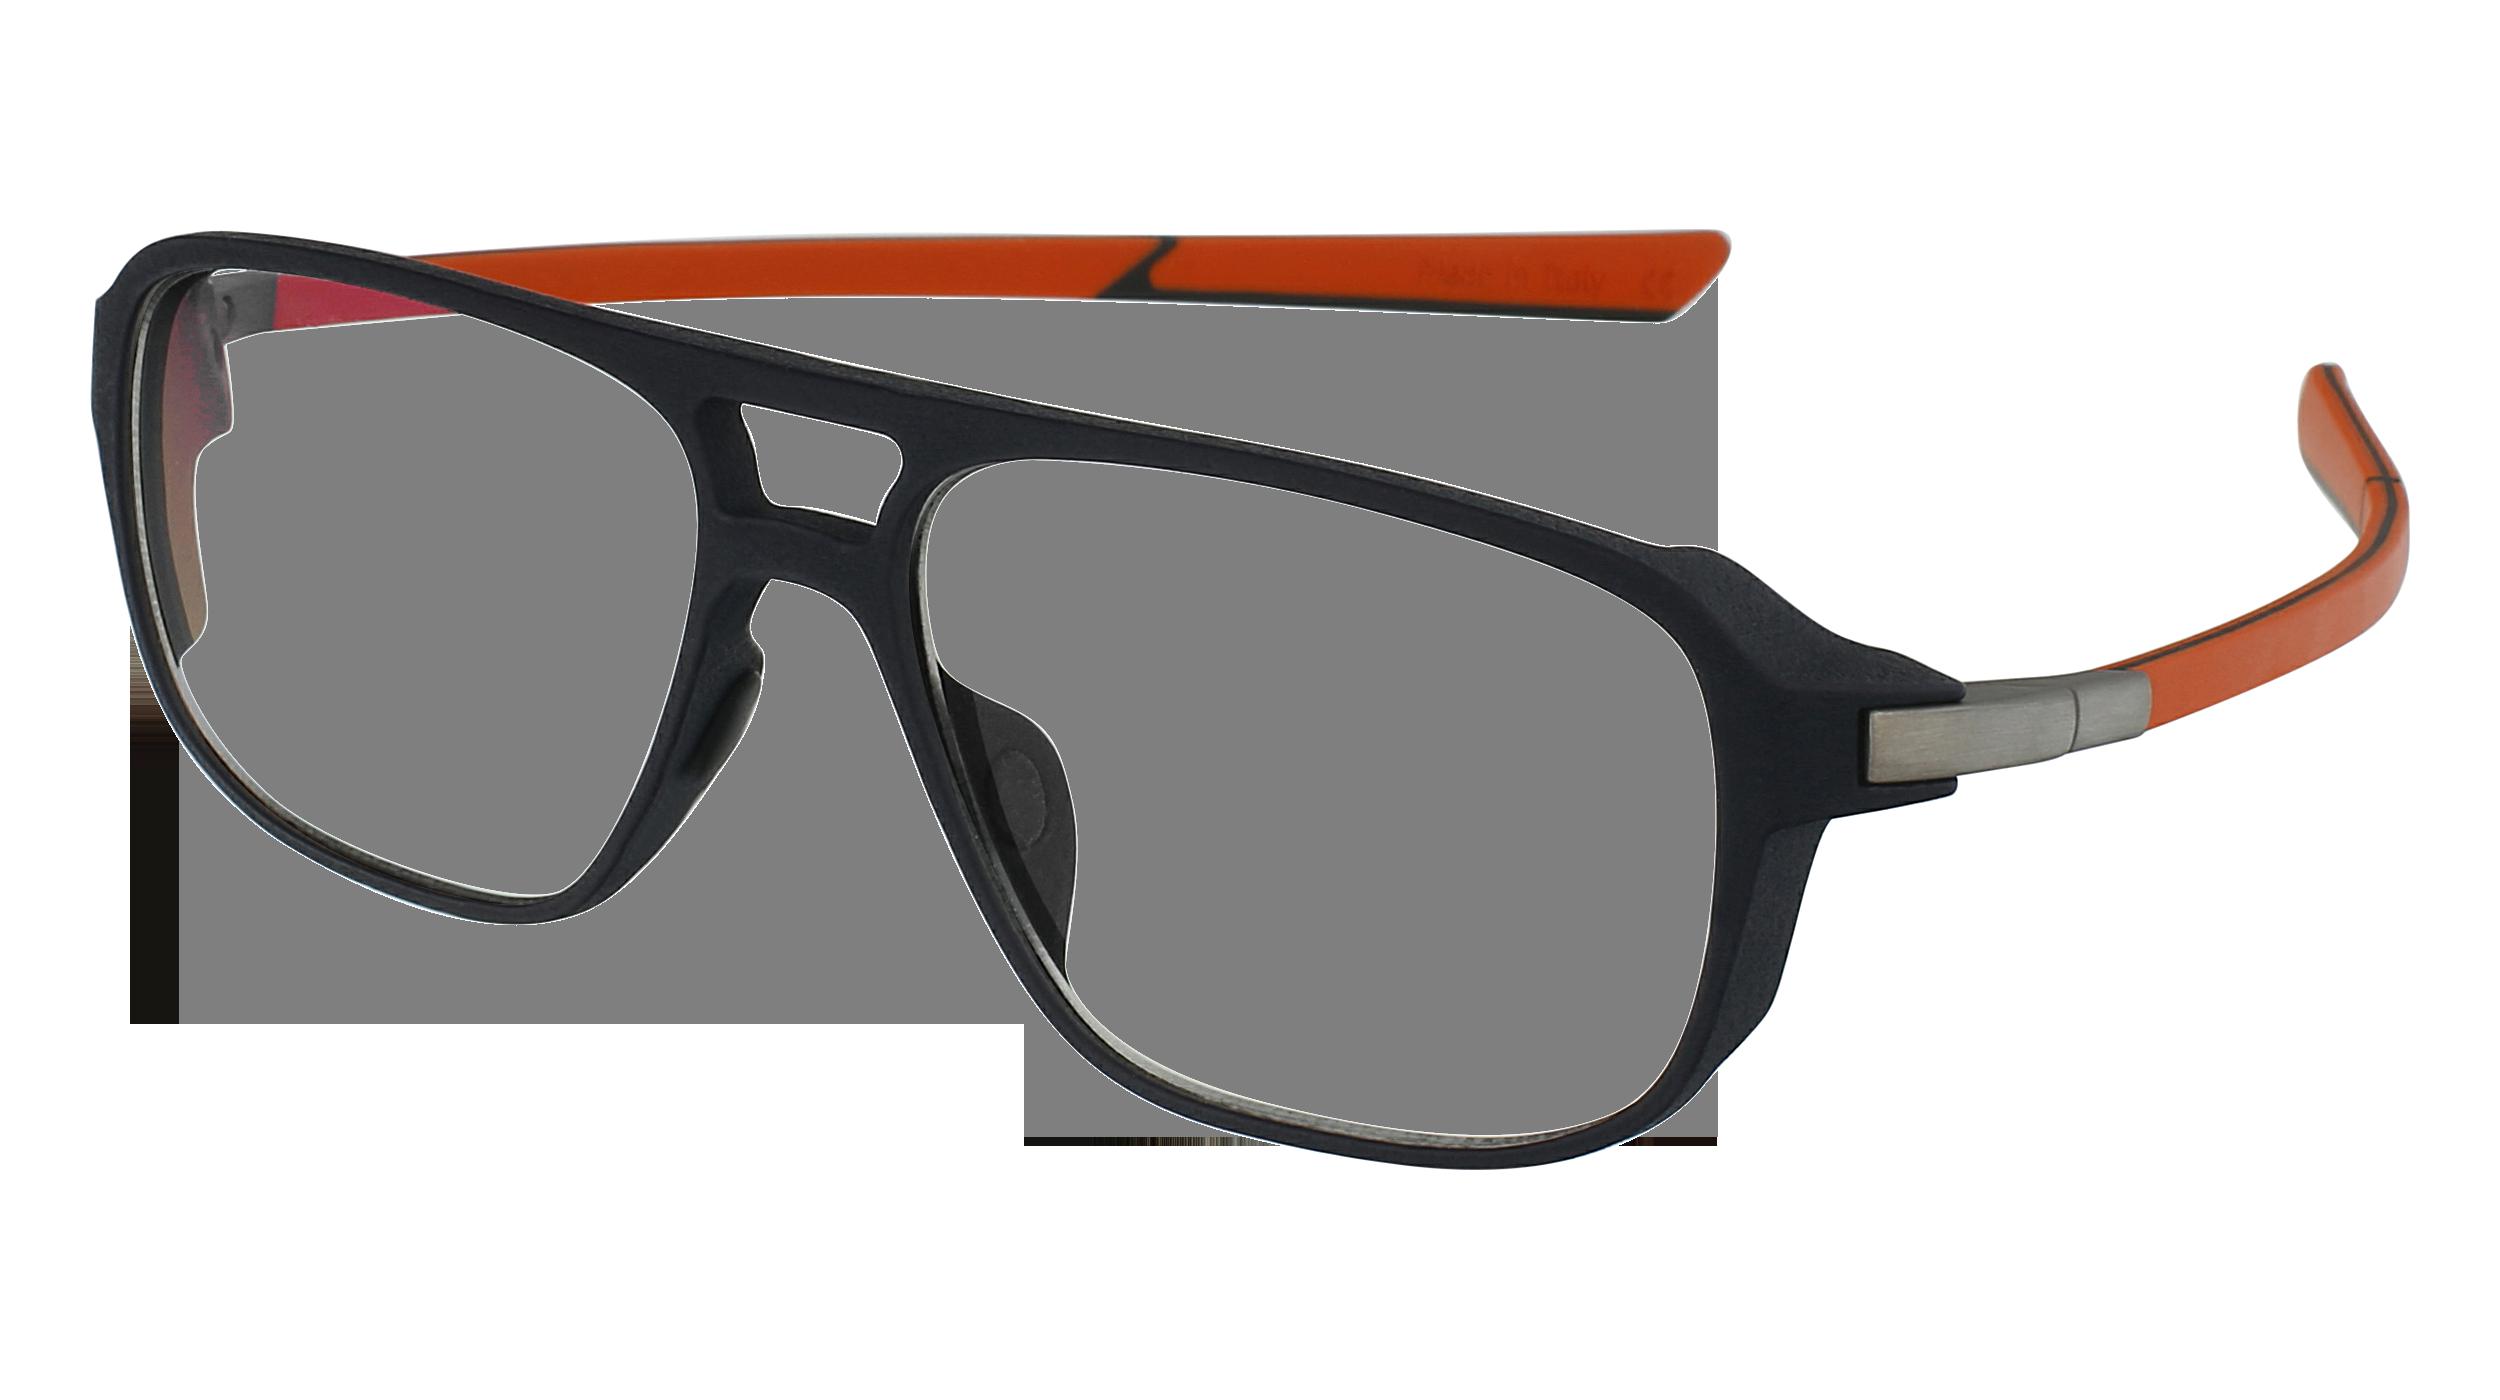 McLaren MLSGPO01.C02.56